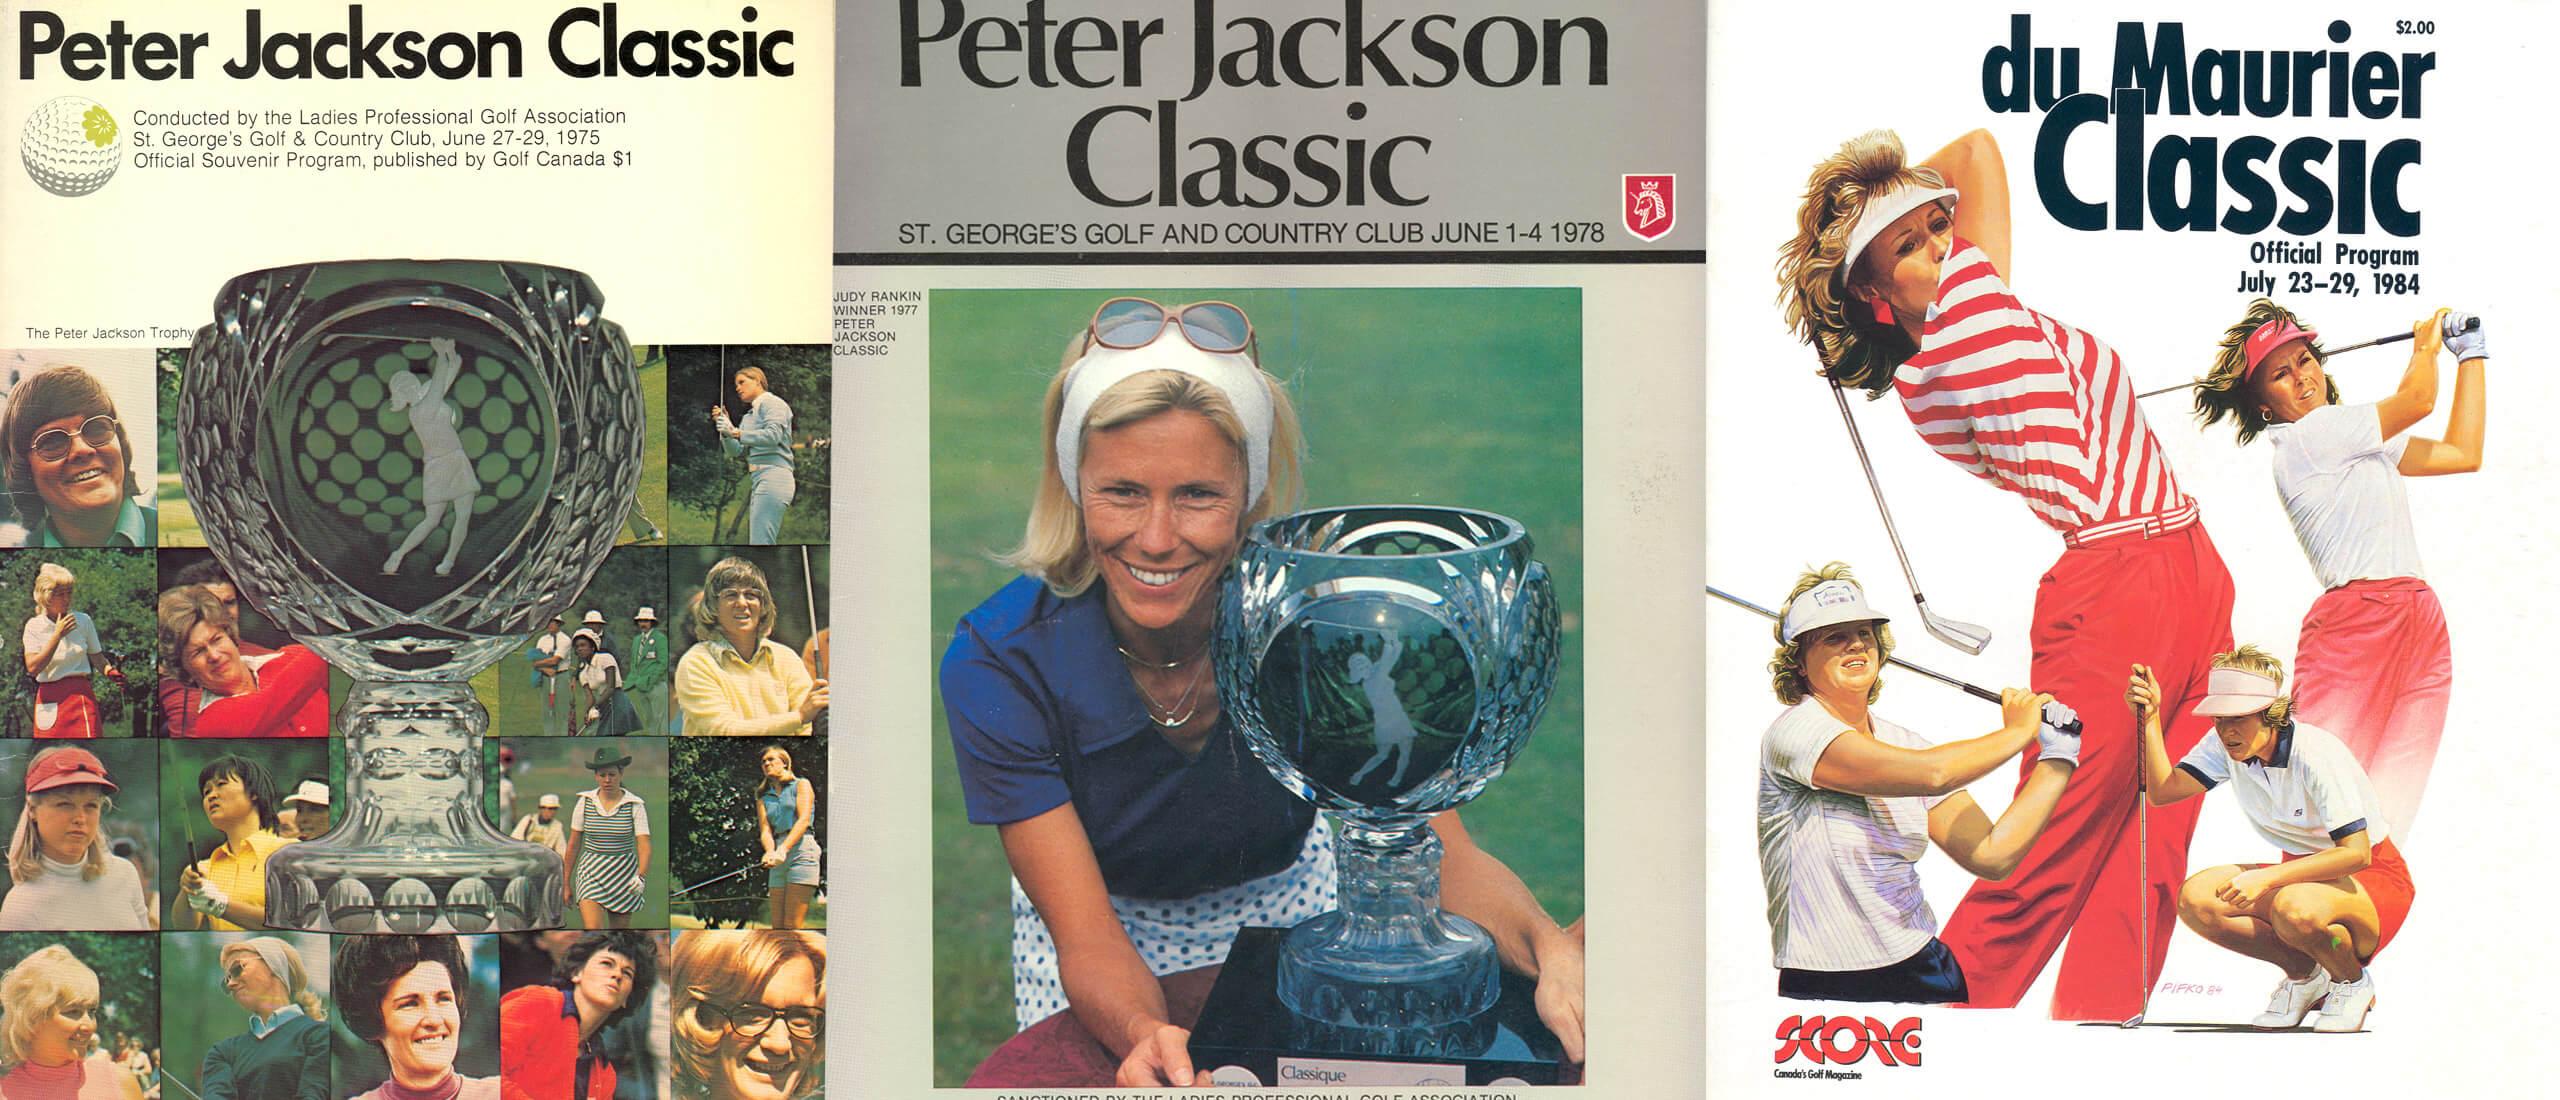 1975-1984 – St. George's Tests LPGA Players